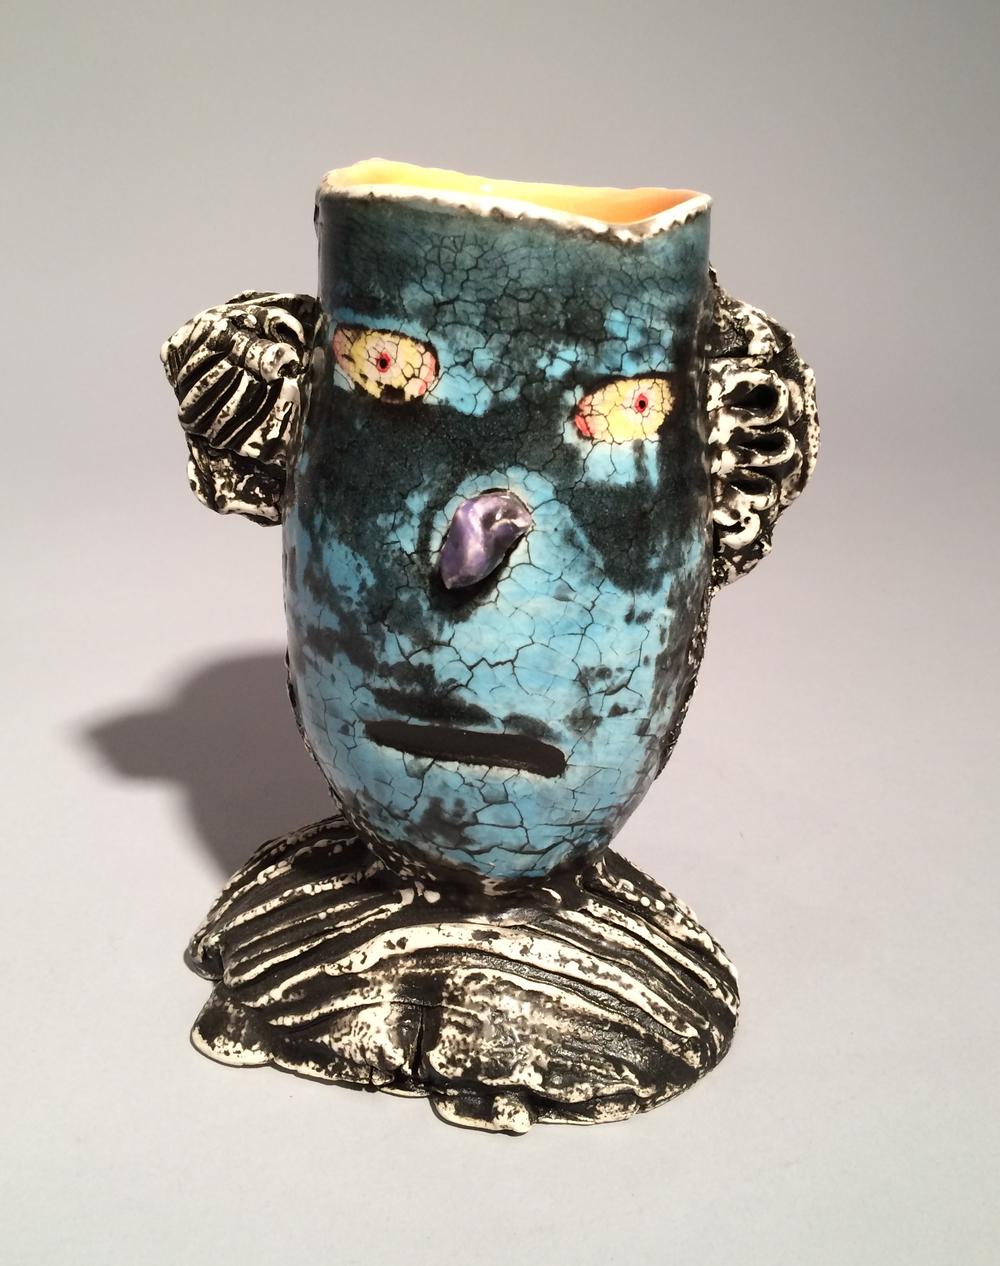 Andy Nasisse, Cup, ceramic, Sherrie Gallerie